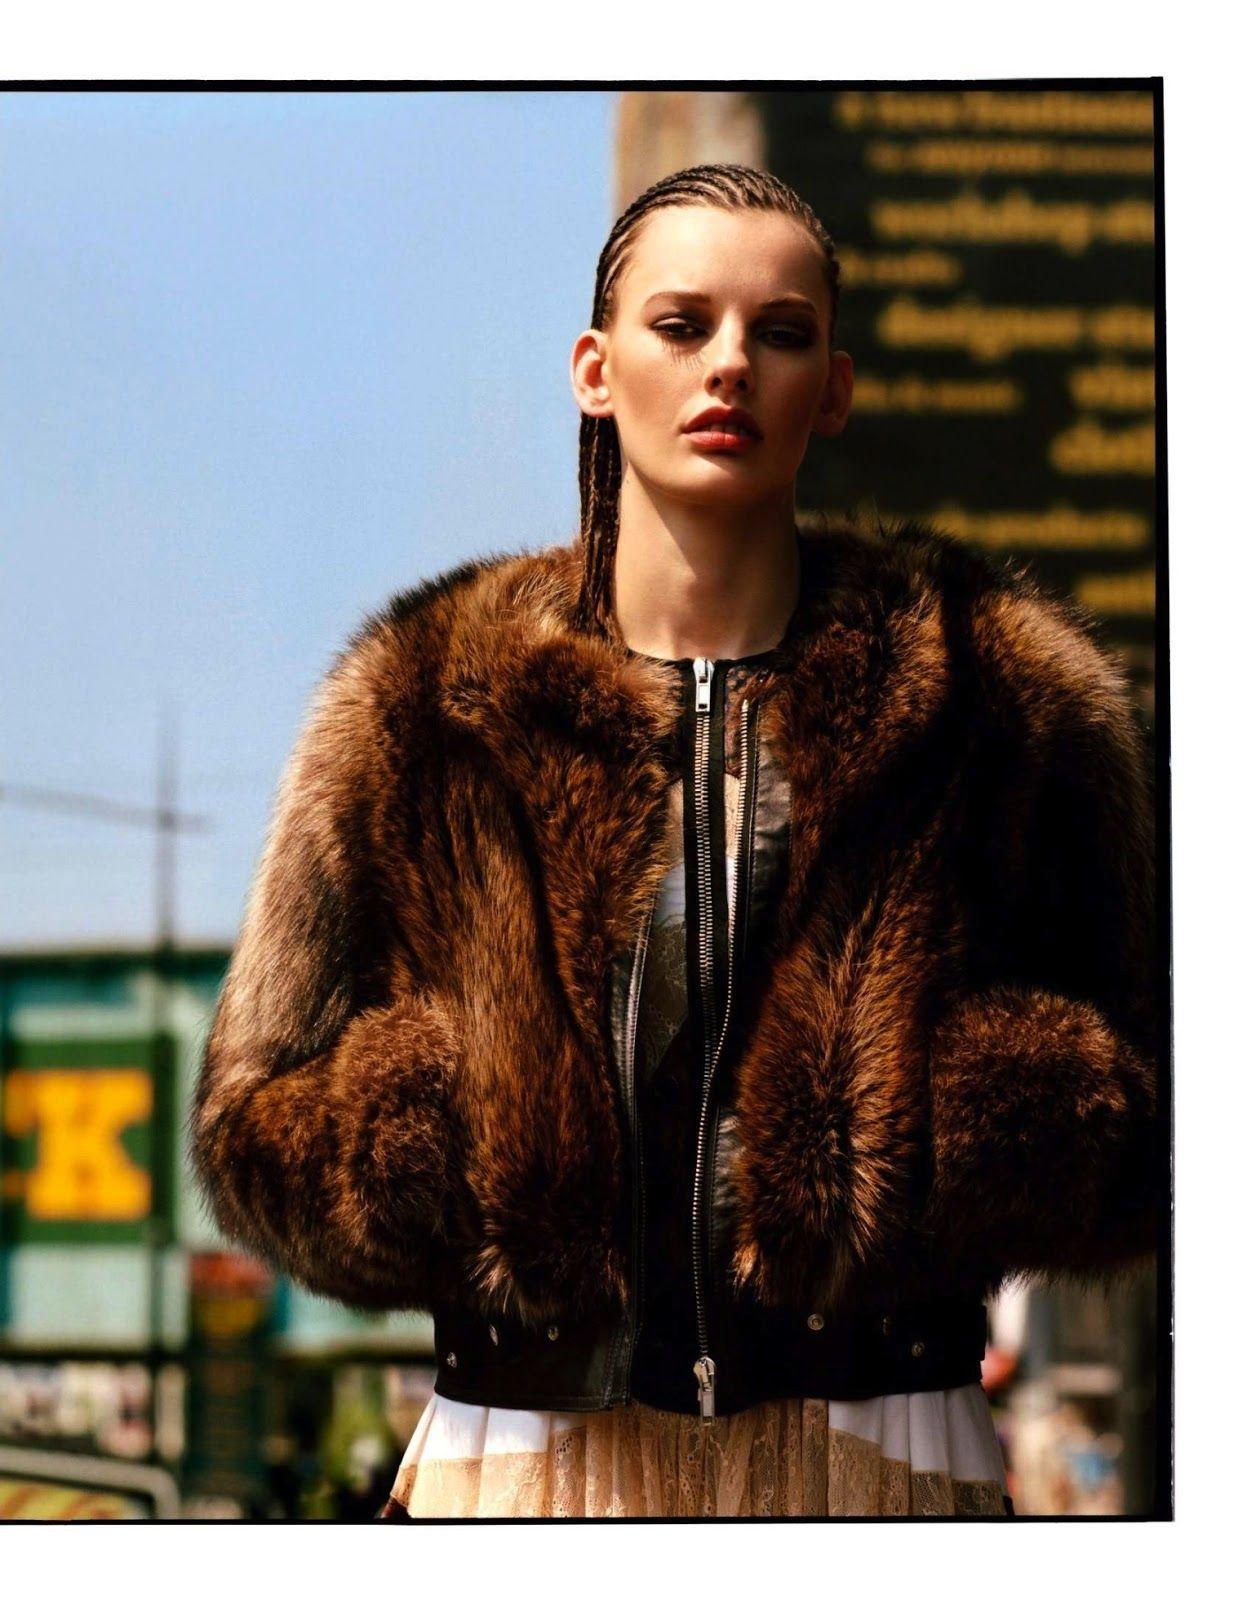 visual optimism; fashion editorials, shows, campaigns & more!: camden road: amanda murphy by alasdair mclellan for vogue paris august 2013